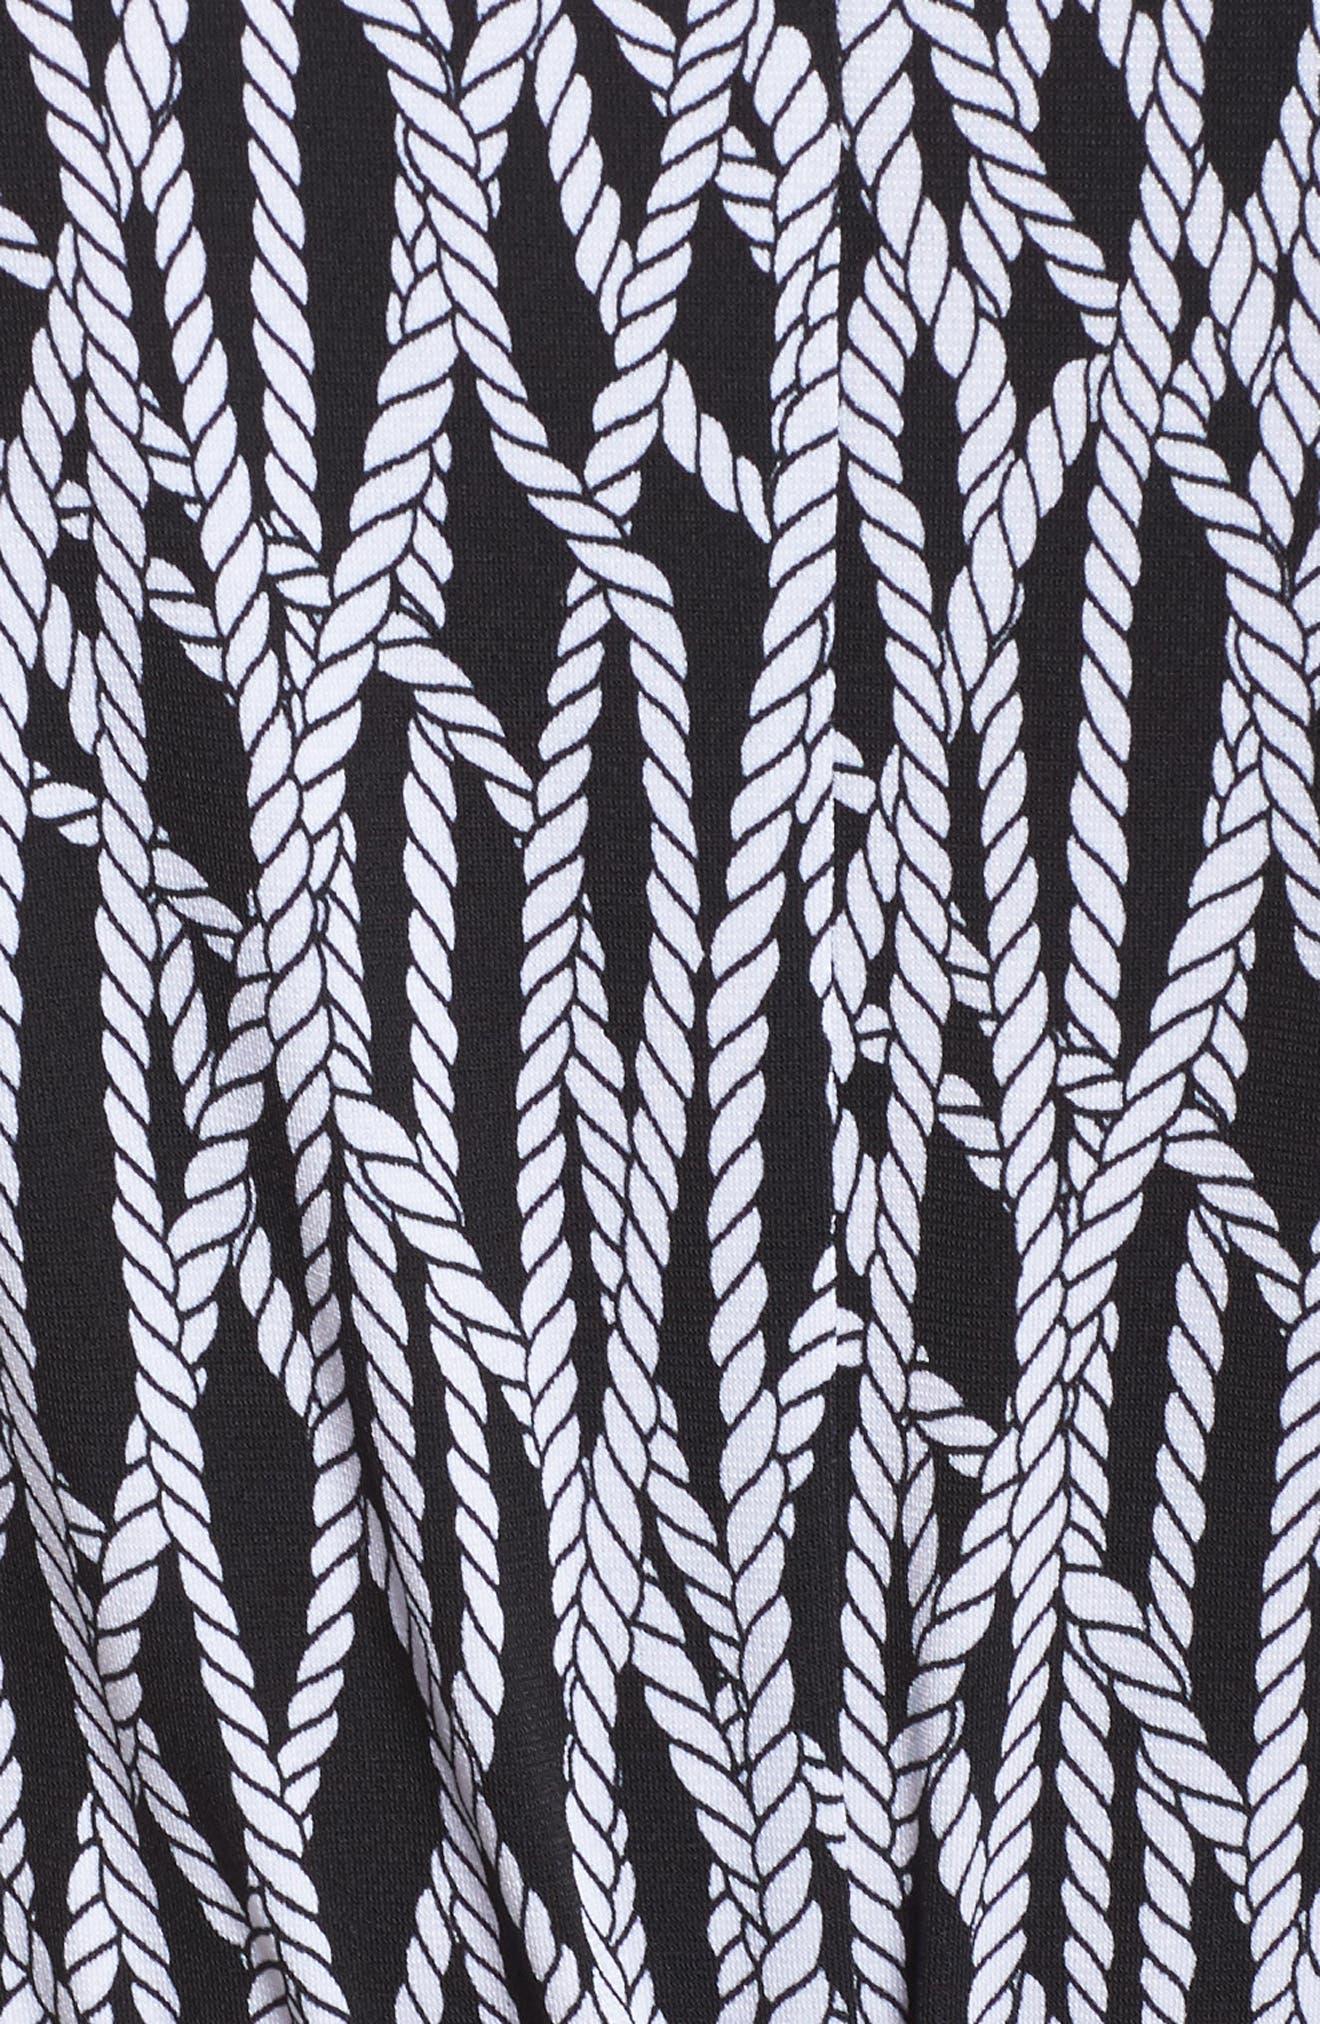 Chained Keyhole Neck Jumpsuit,                             Alternate thumbnail 5, color,                             Black/ White